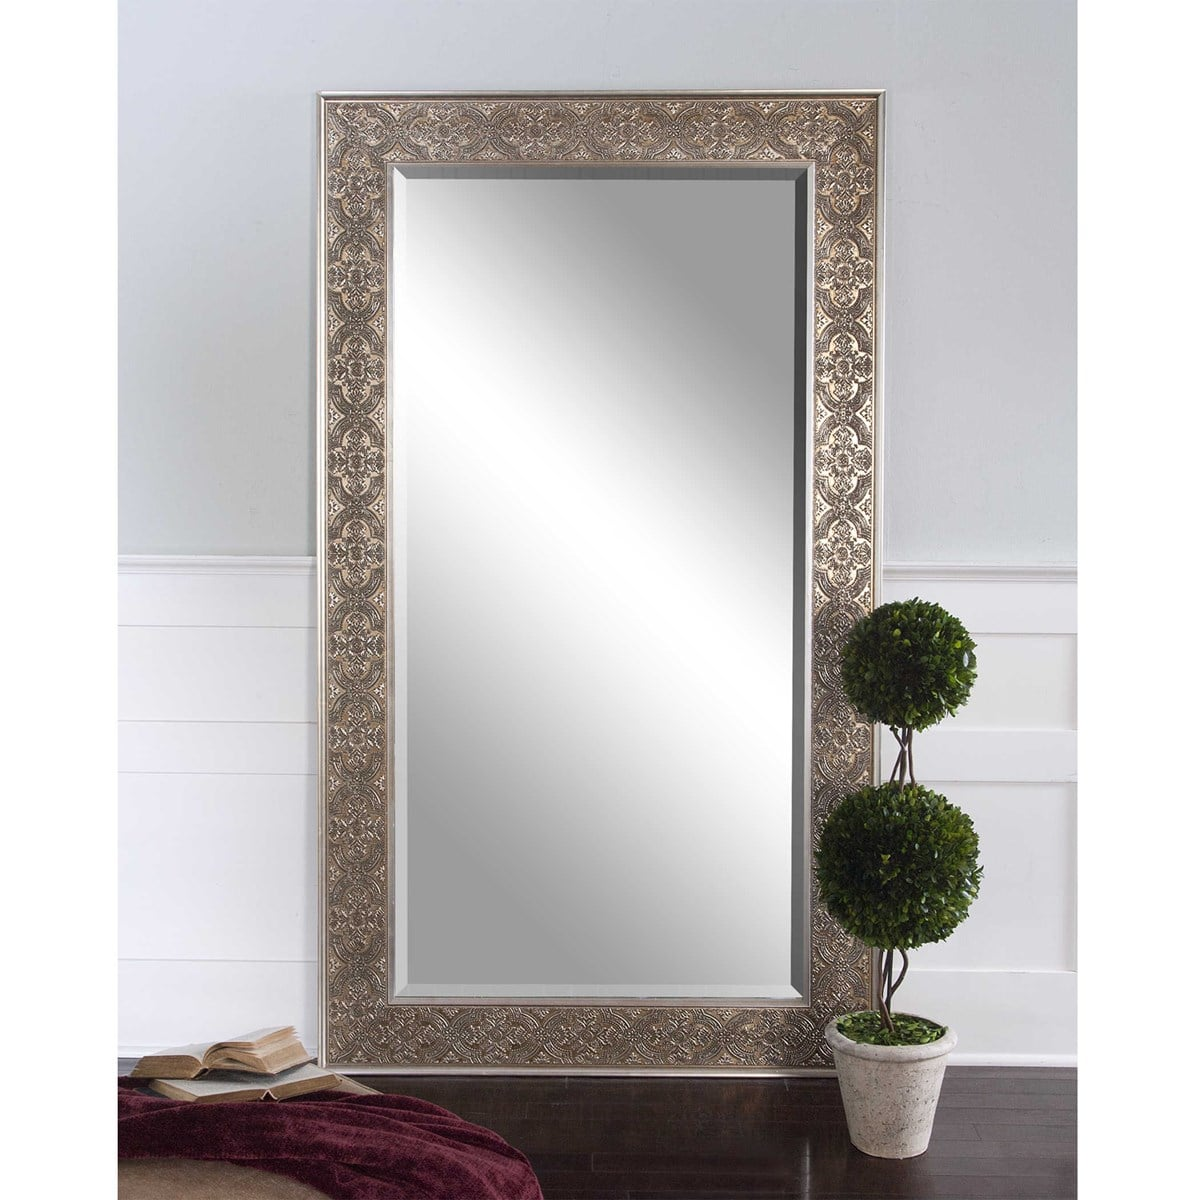 Villata Mirror santa barbara design center 34392-1